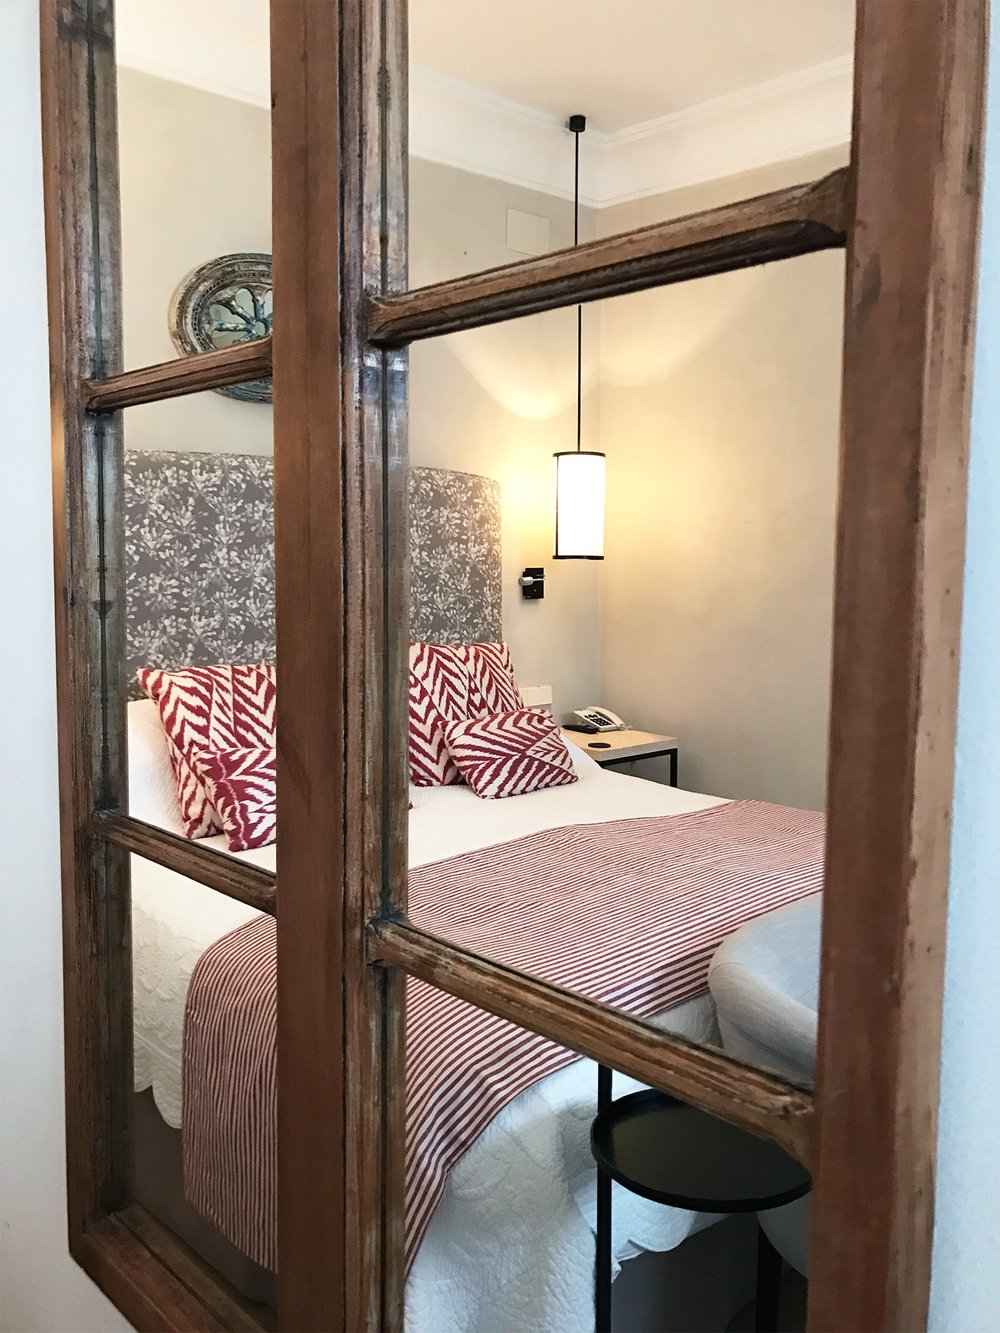 Corral del Rey hotel Seville Spain hotel room mirror.jpg